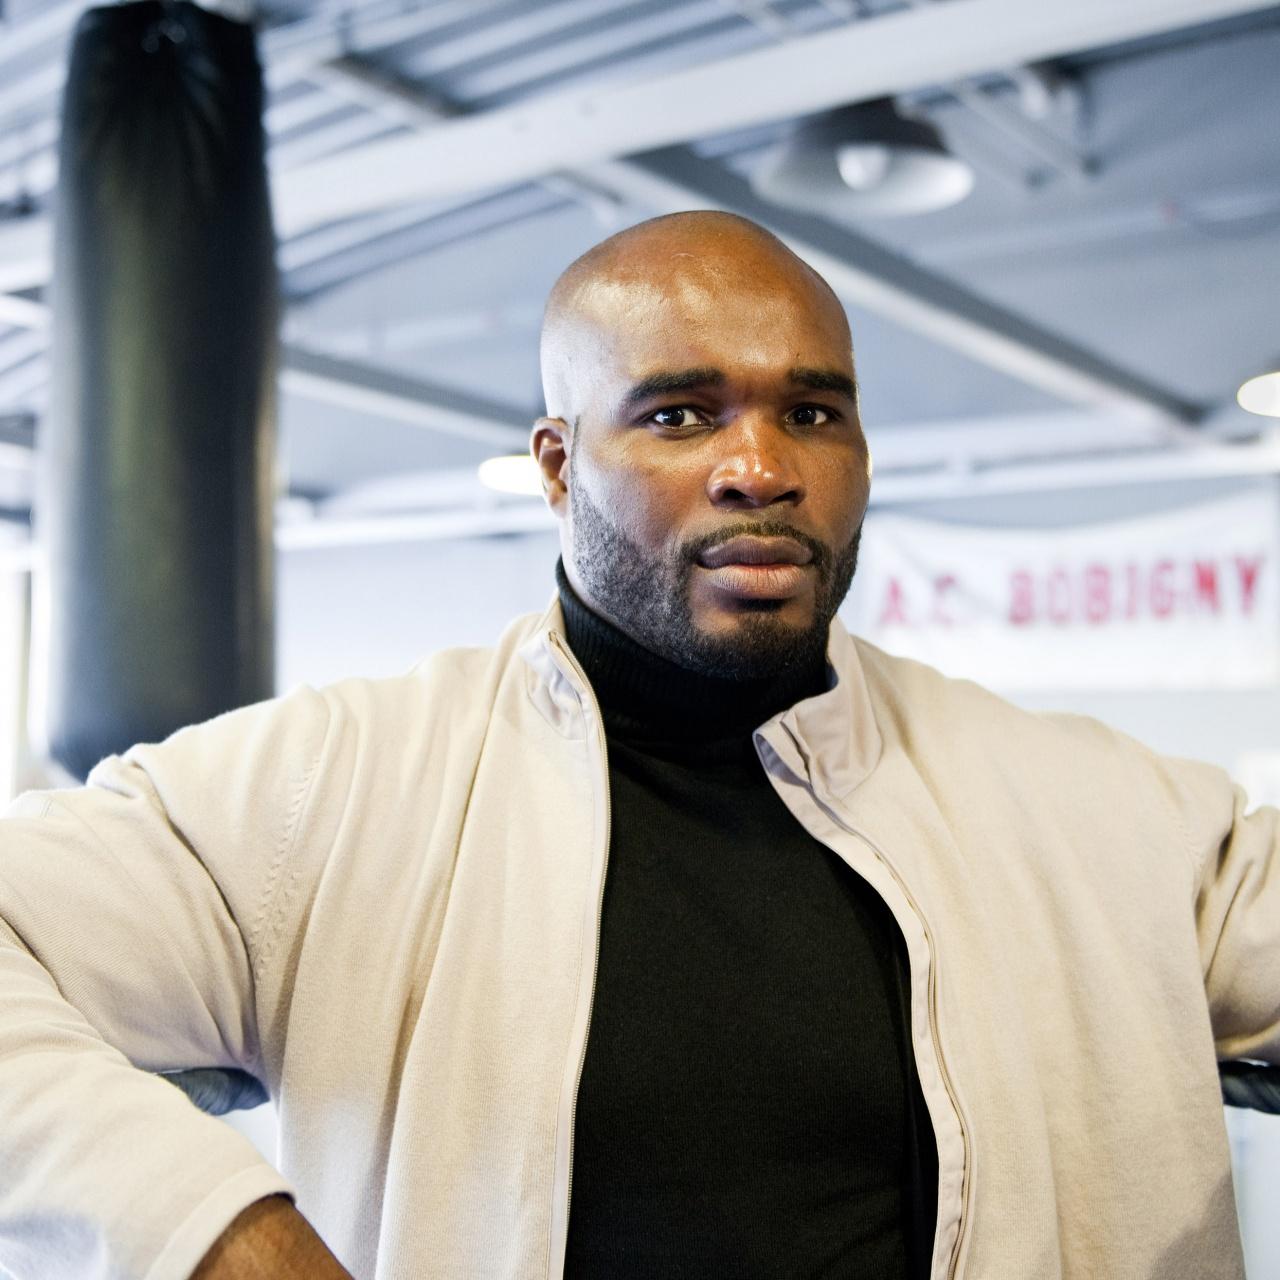 world champion boxer Jean-Marc Mormeck